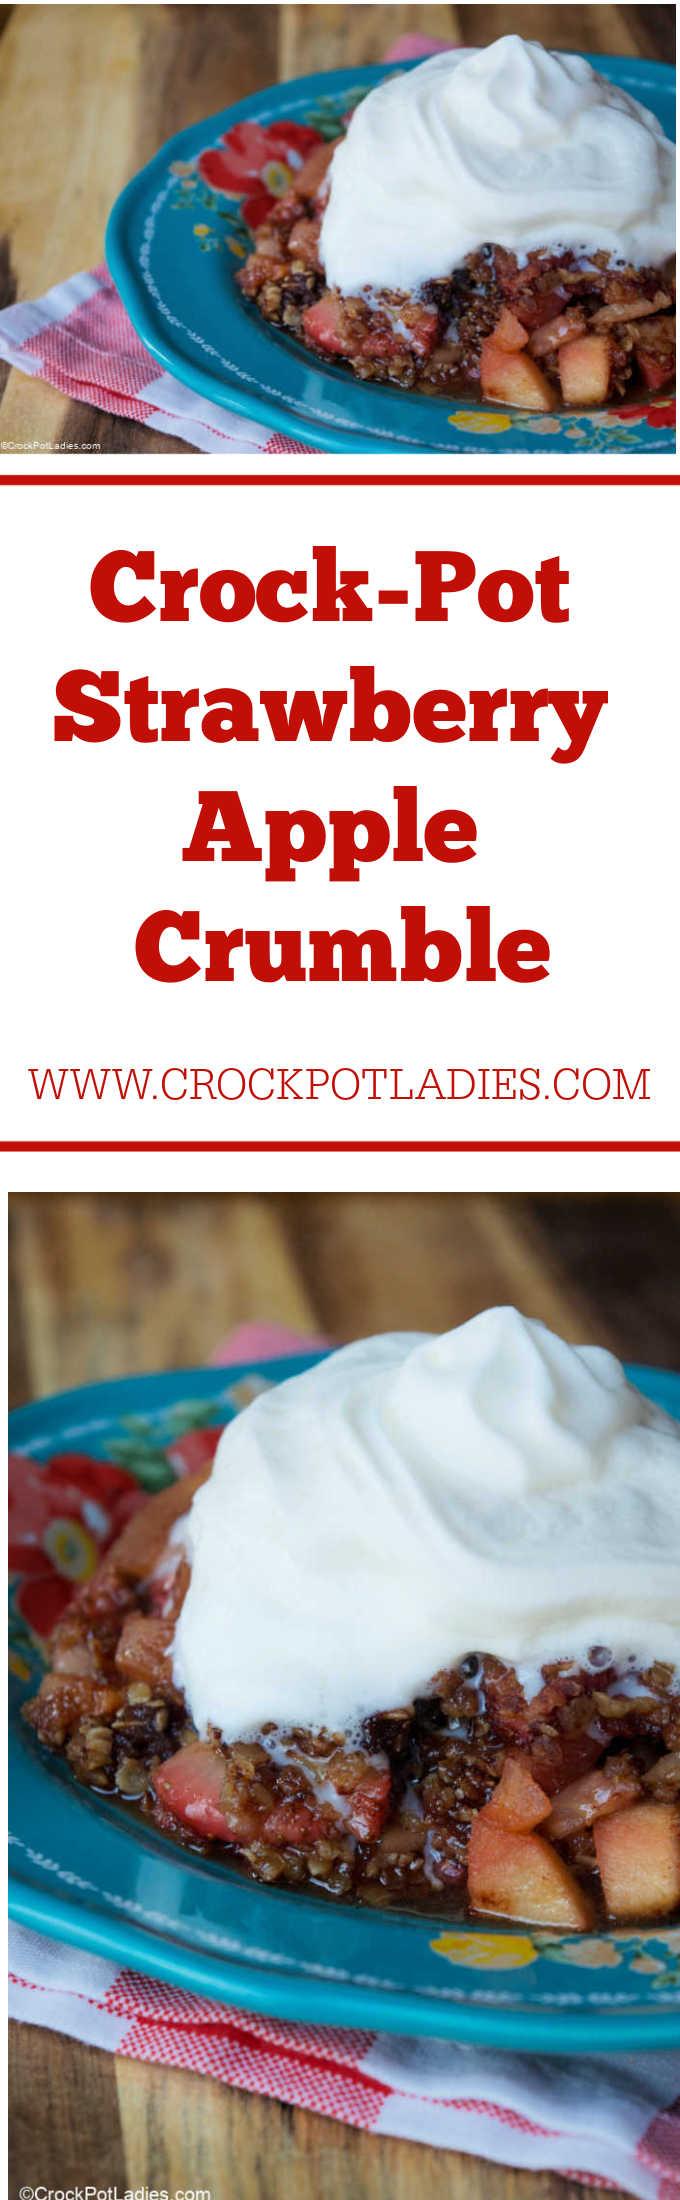 Crock-Pot Strawberry Apple Crumble